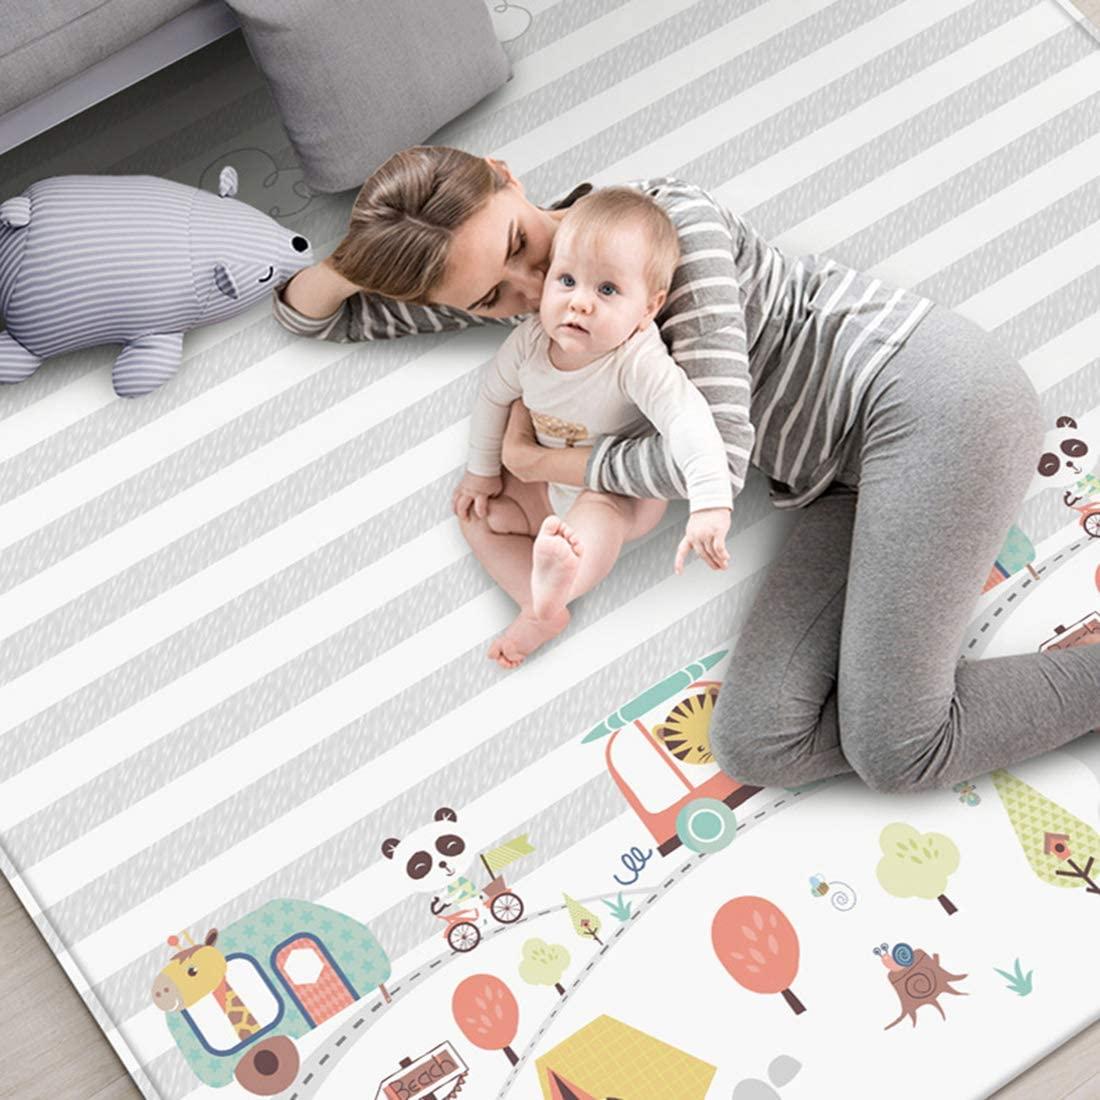 POXL Alfombra de Juegos Bebé Grande, 200 x 180cm Infantil Alfombra Bebe Gateo Impermeable Plegable Alfombra Bebé Acolchada Antideslizante